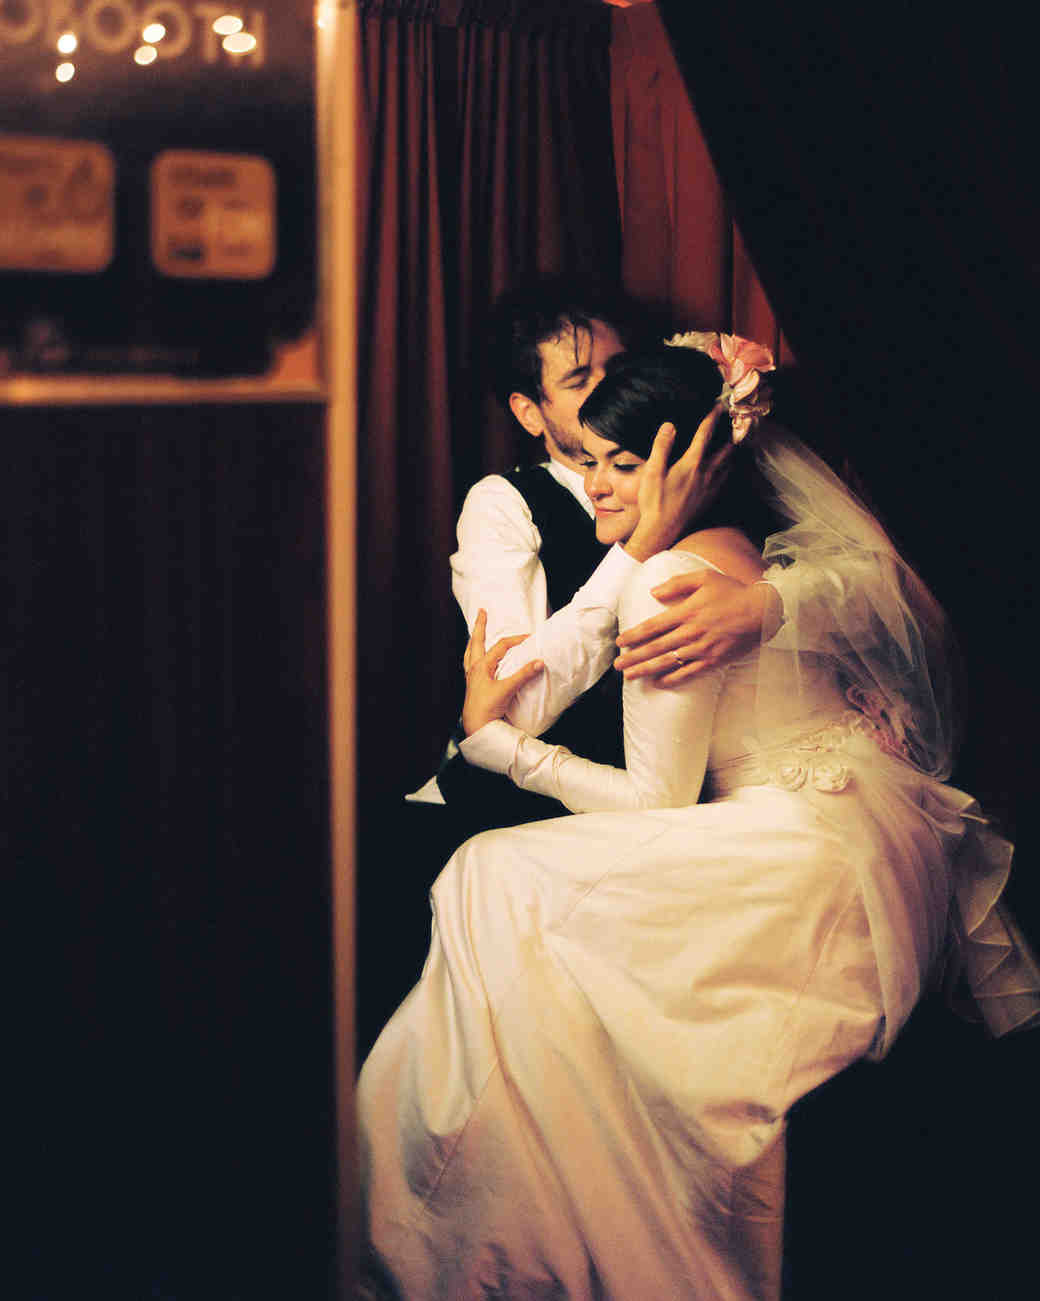 carrie-dan-reception-bride-groom-photo-booth-053114-r-123-s111627.jpg